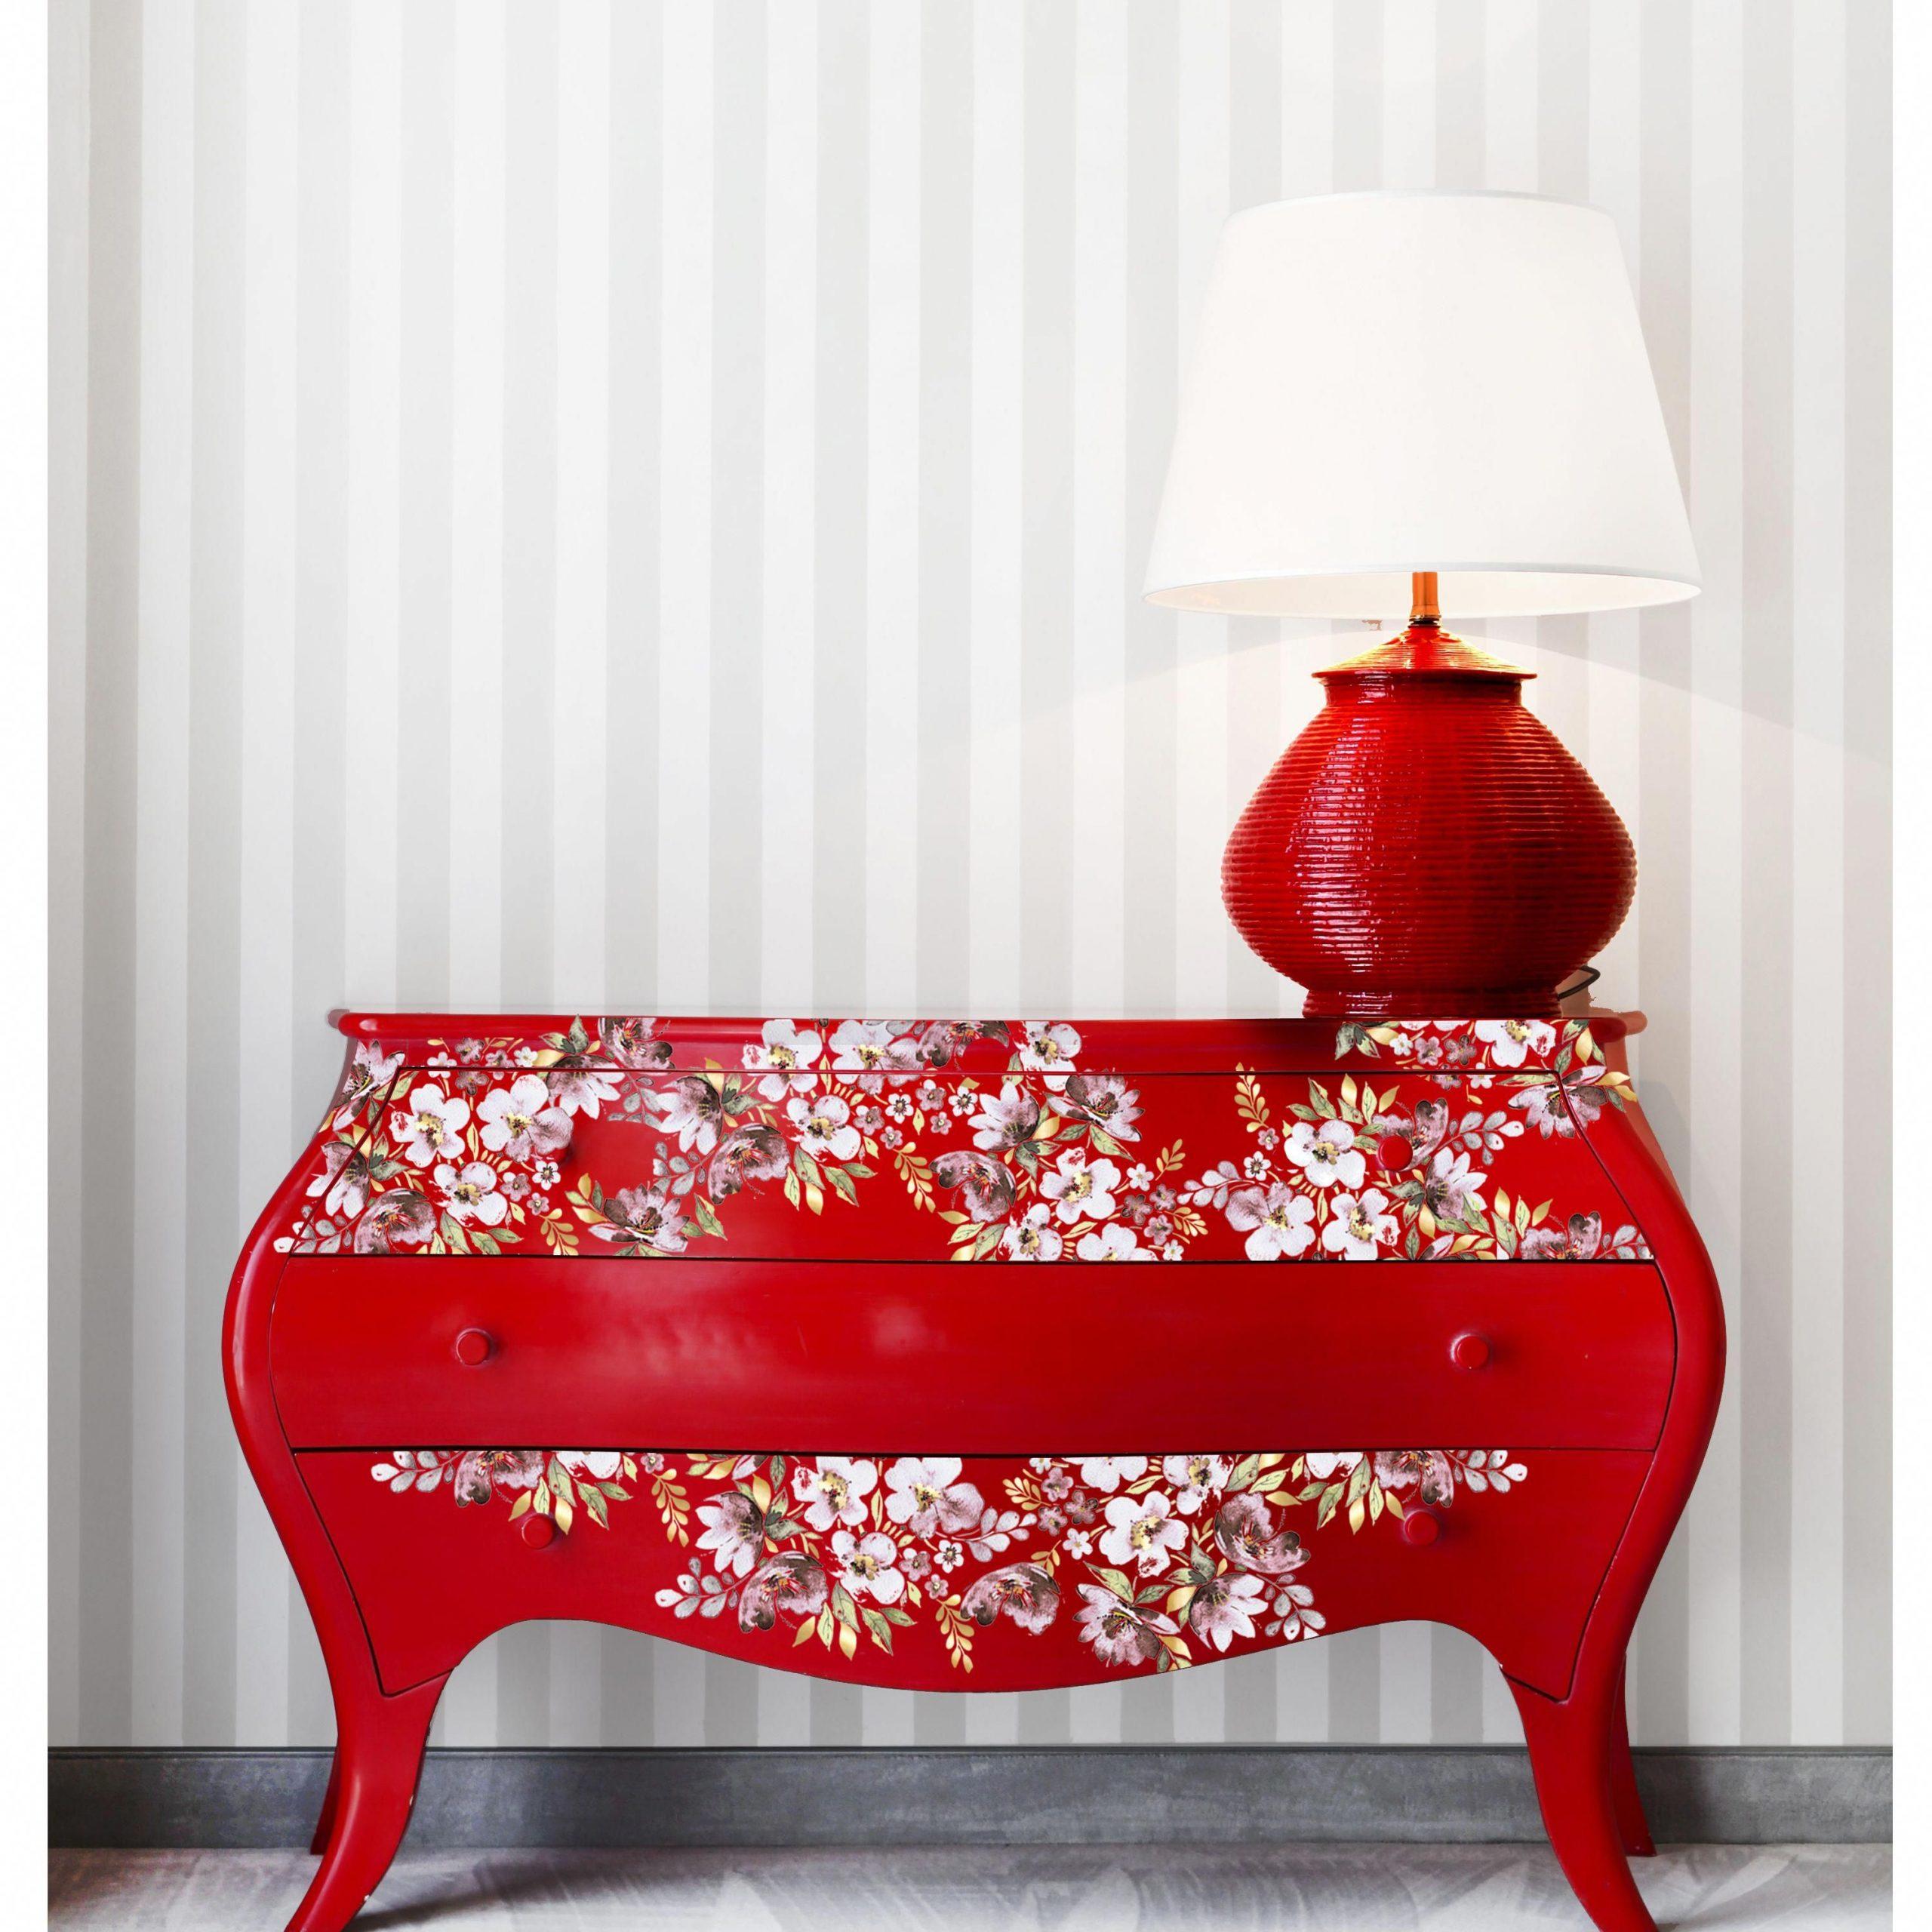 Shabby Chic Furniture Paint #Shabbychicfurniture   Decor Within Shabby Chic Sofas (View 11 of 15)